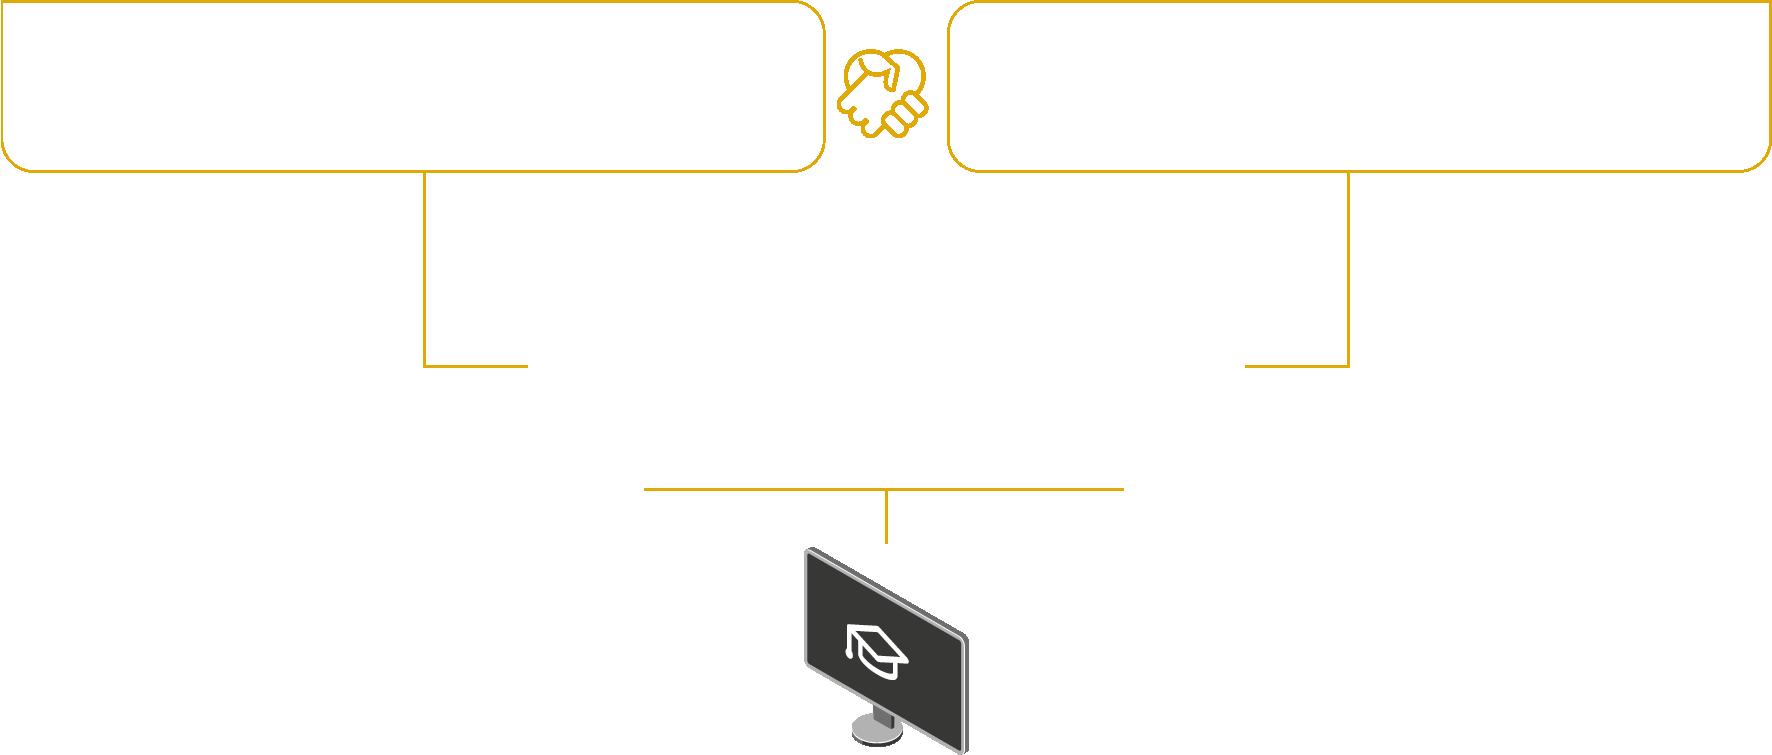 EC-Aunege Schéma